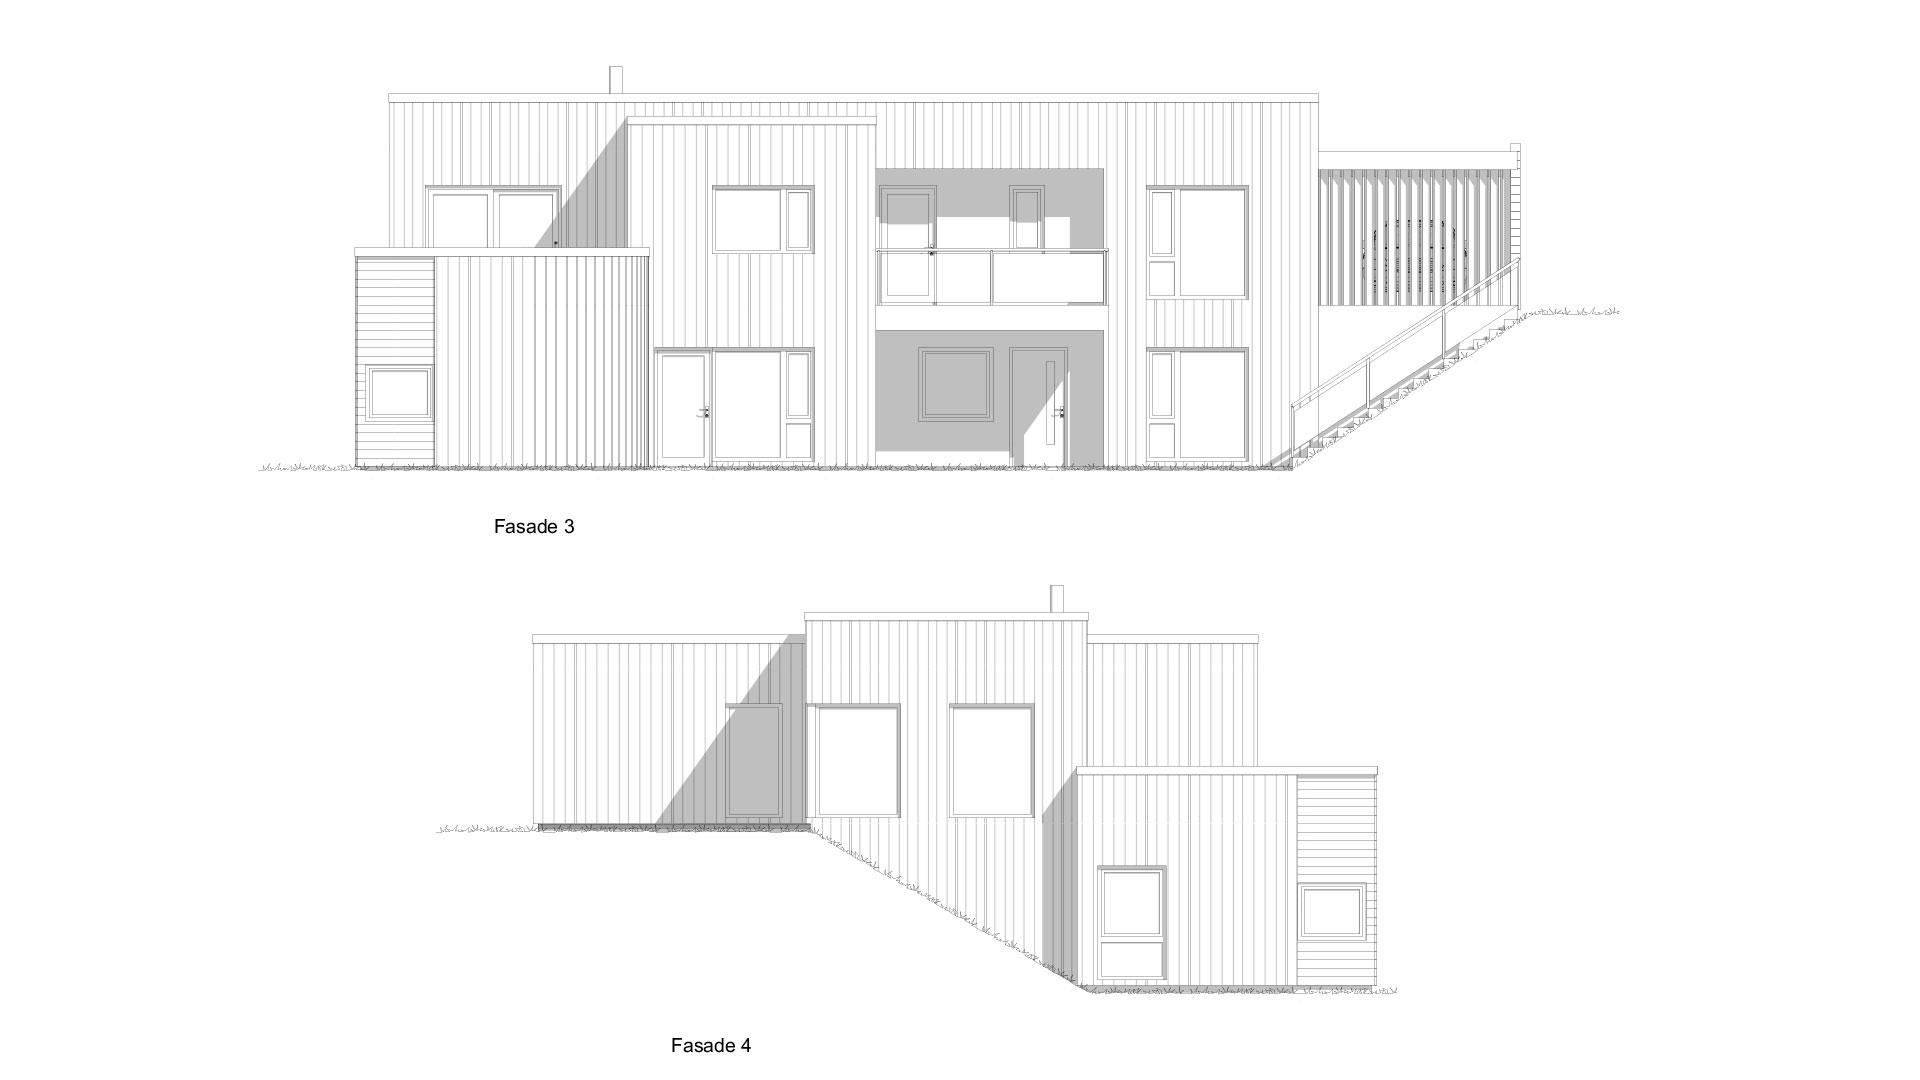 Syklus_Fasade3-4.jpg